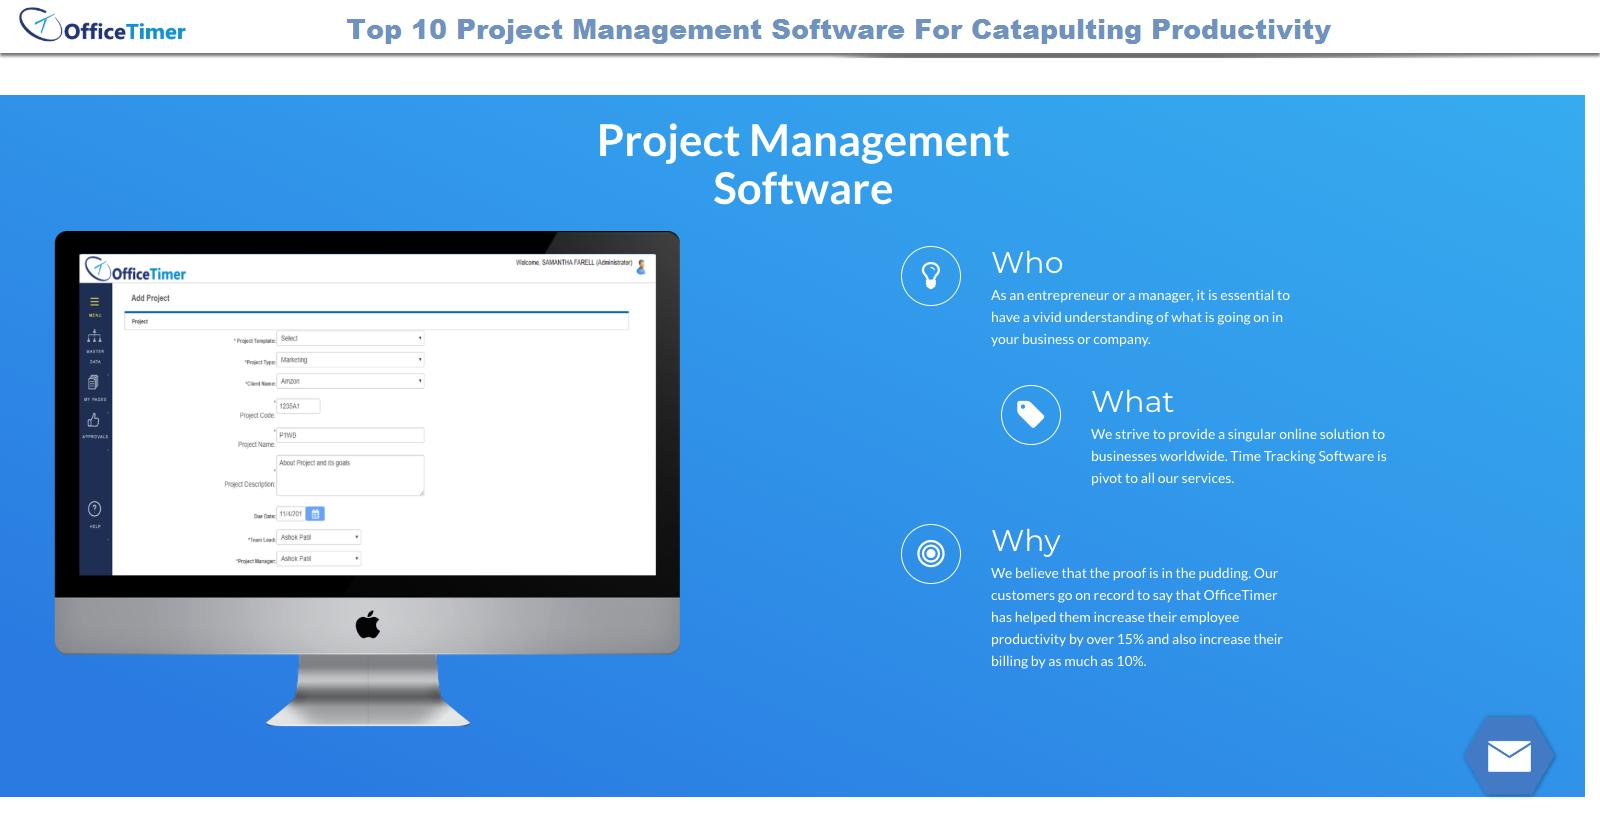 Project Management-OfficeTimer